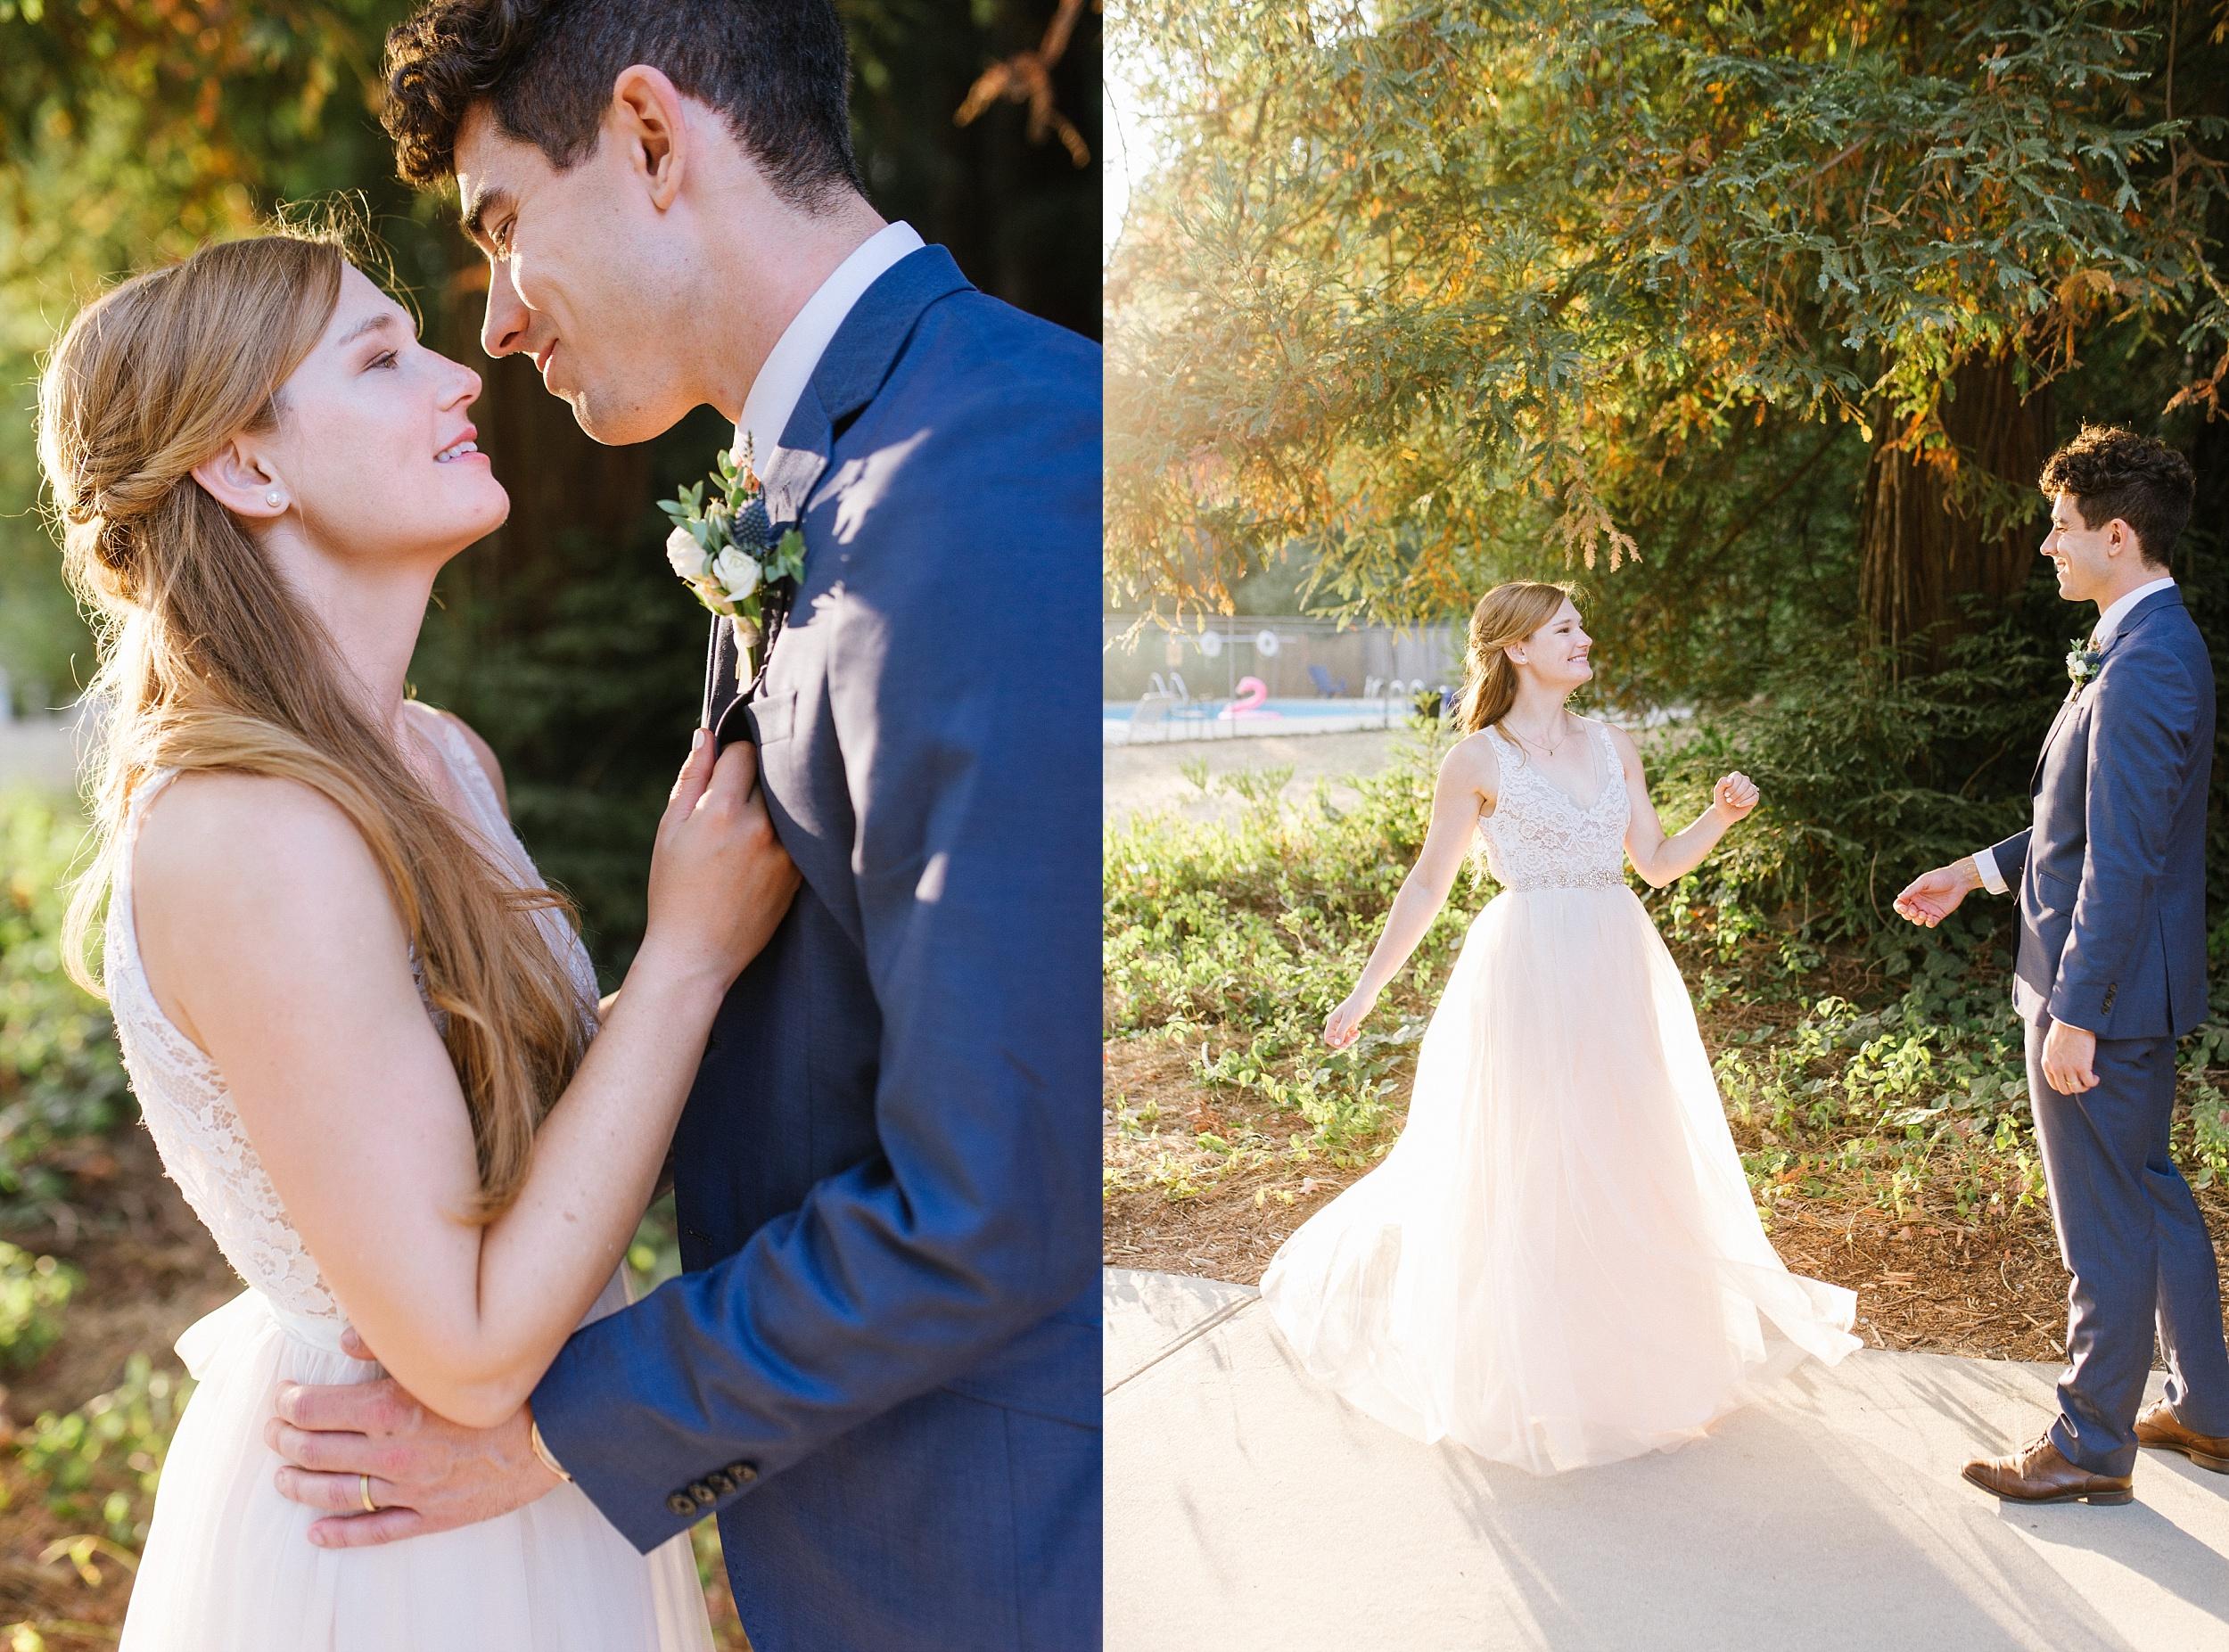 Amphitheatre-of-the-Redwoods-wedding-erikariley_chelsea-dier-photography_0037.jpg